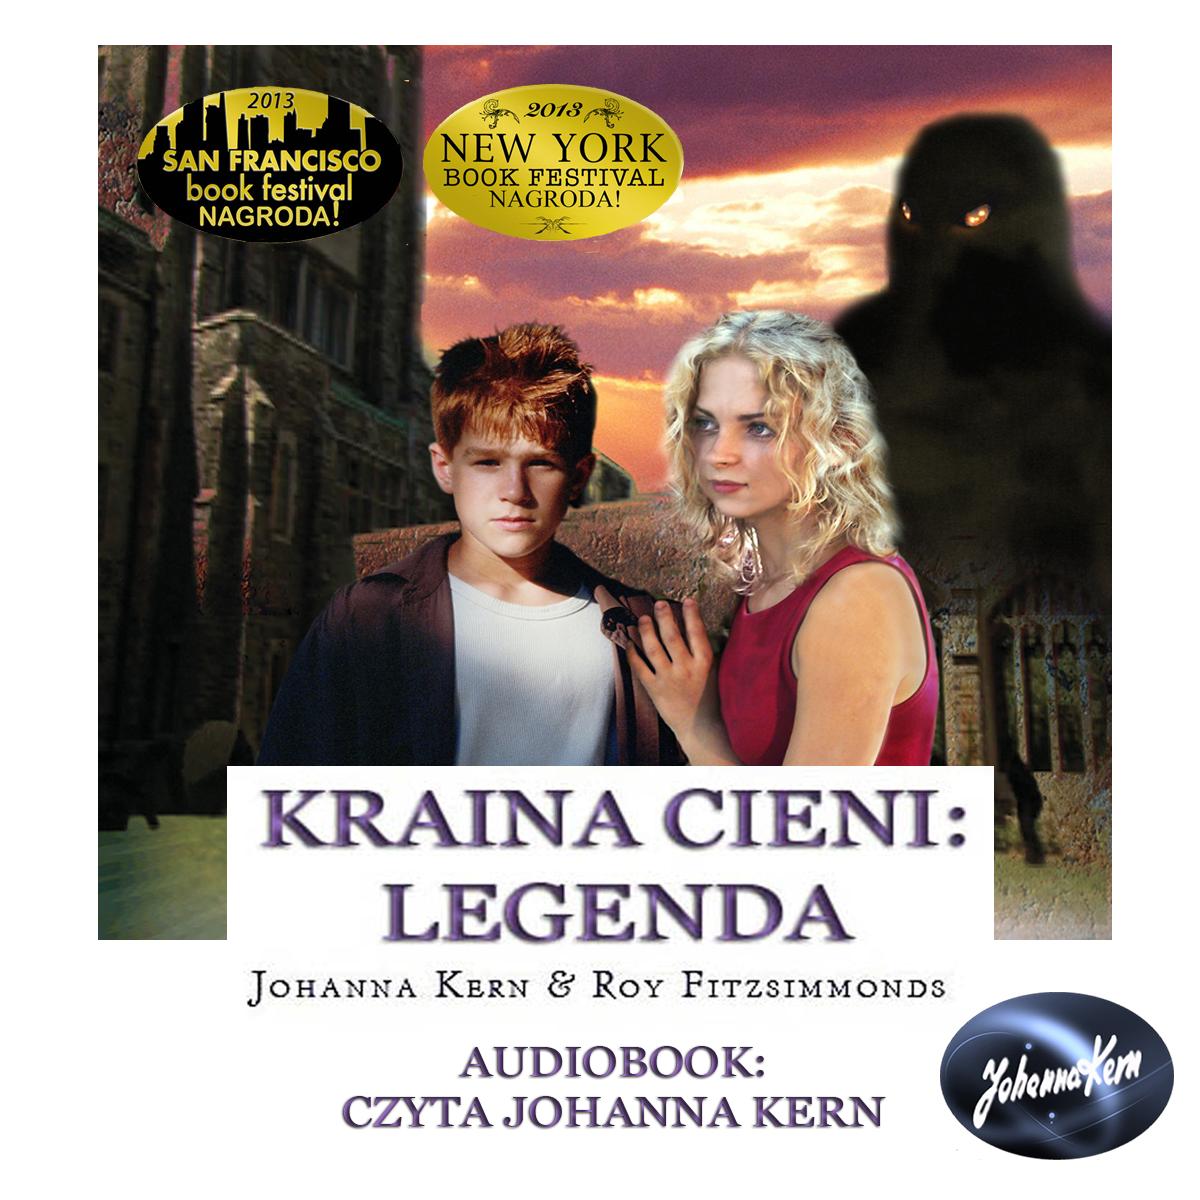 KRAINA CIENI AUDIOBOOK_front